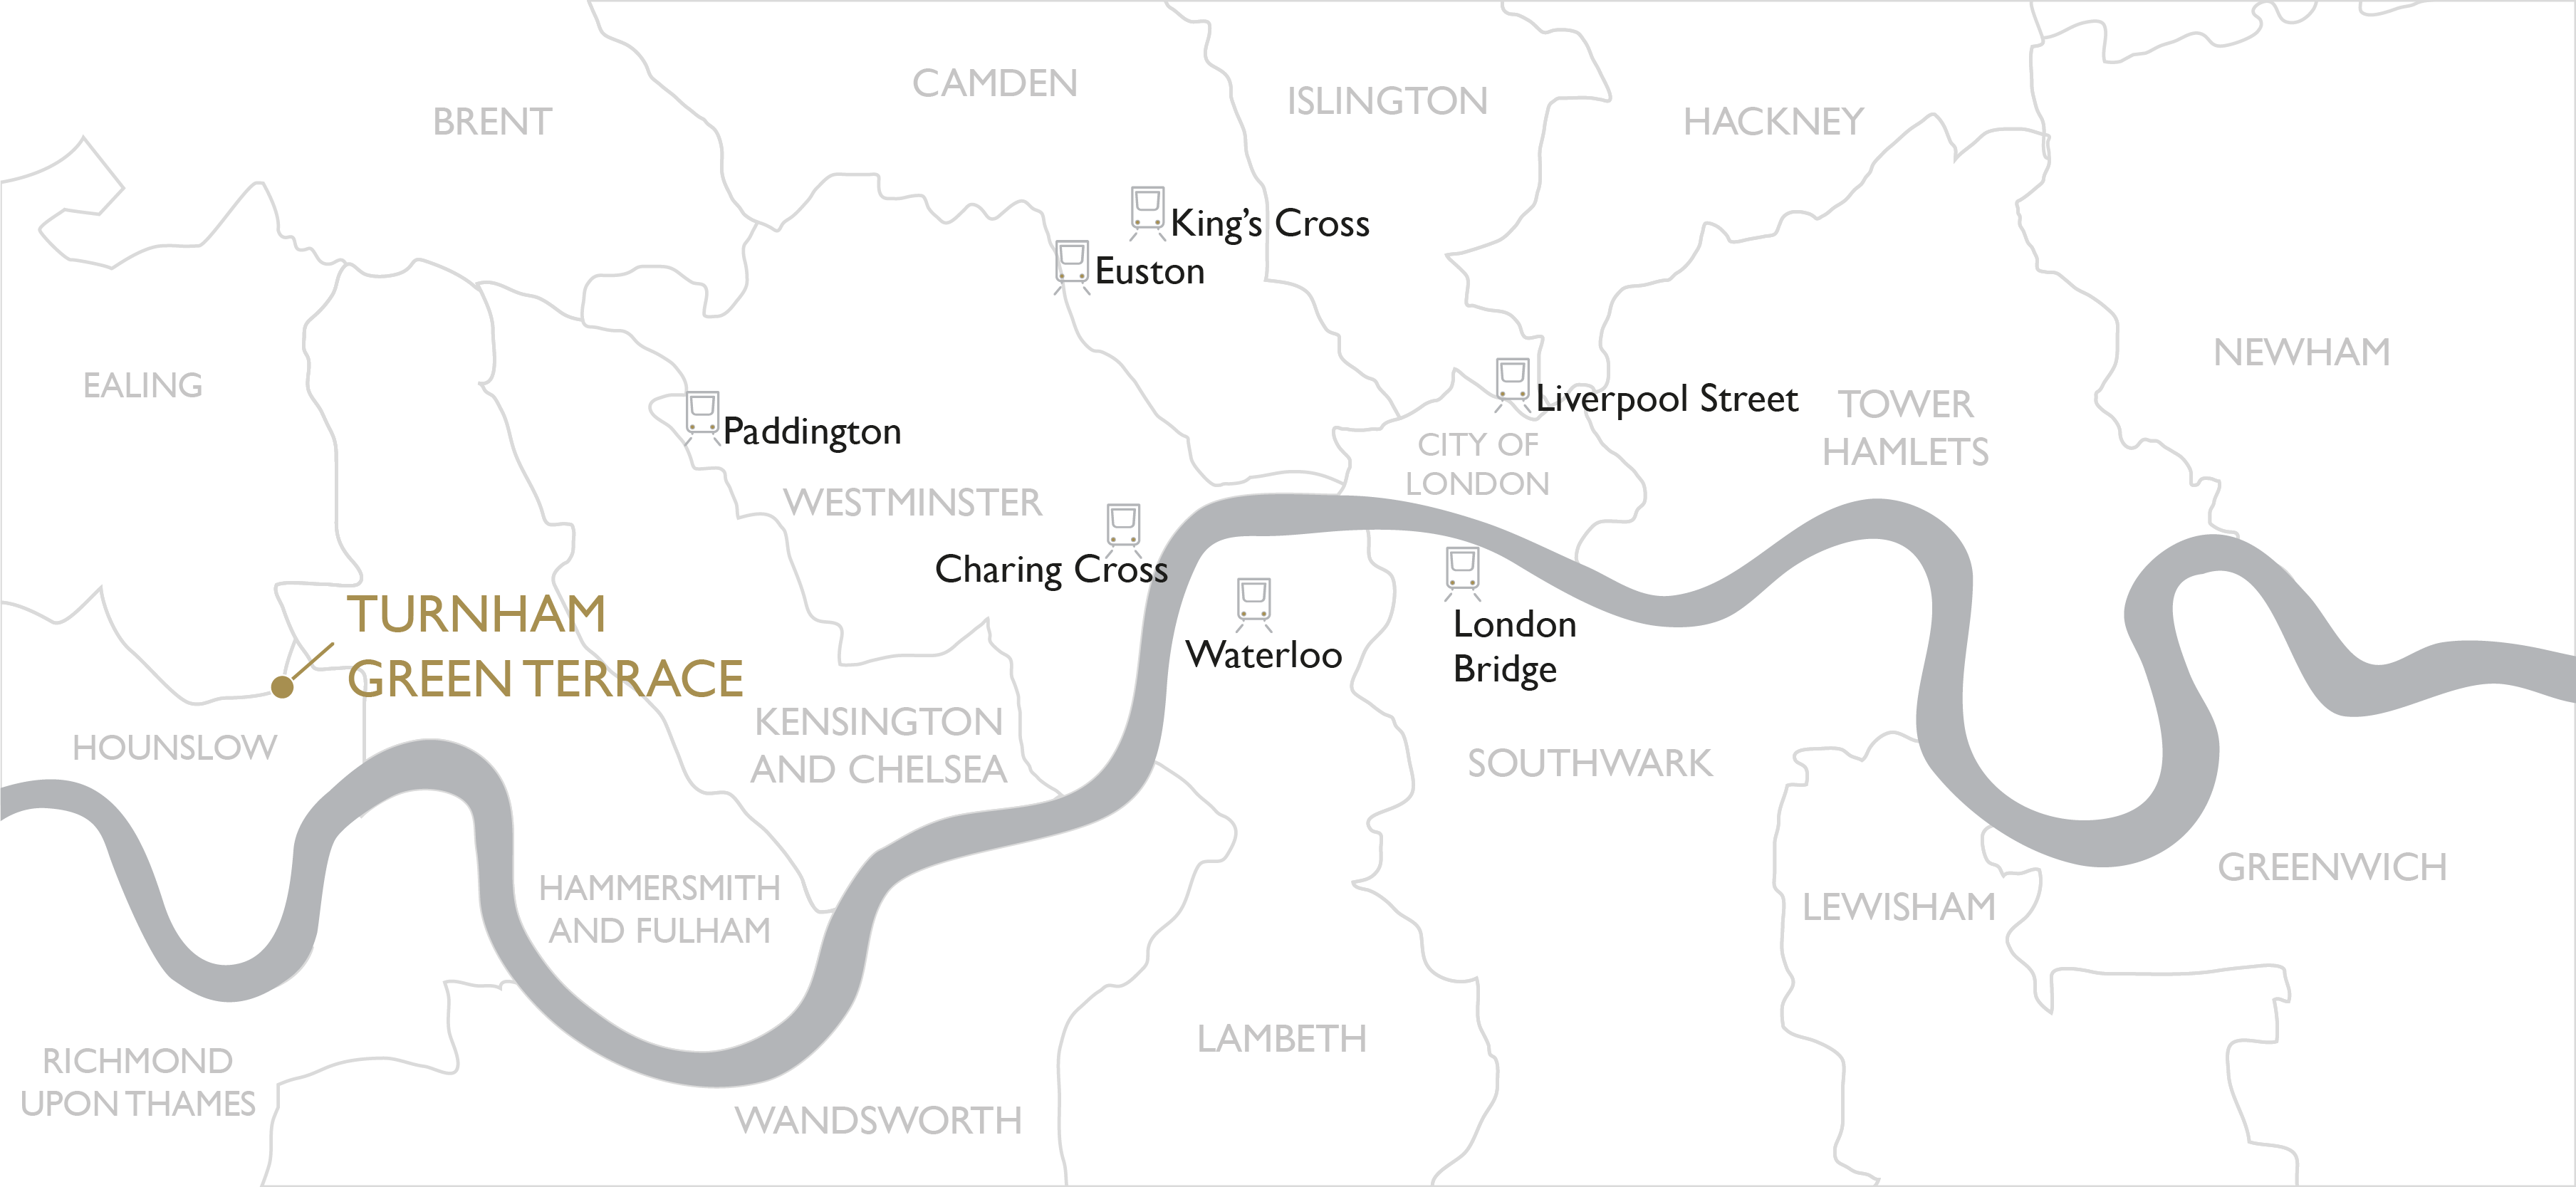 Map of Turnham Green Terrace in West London